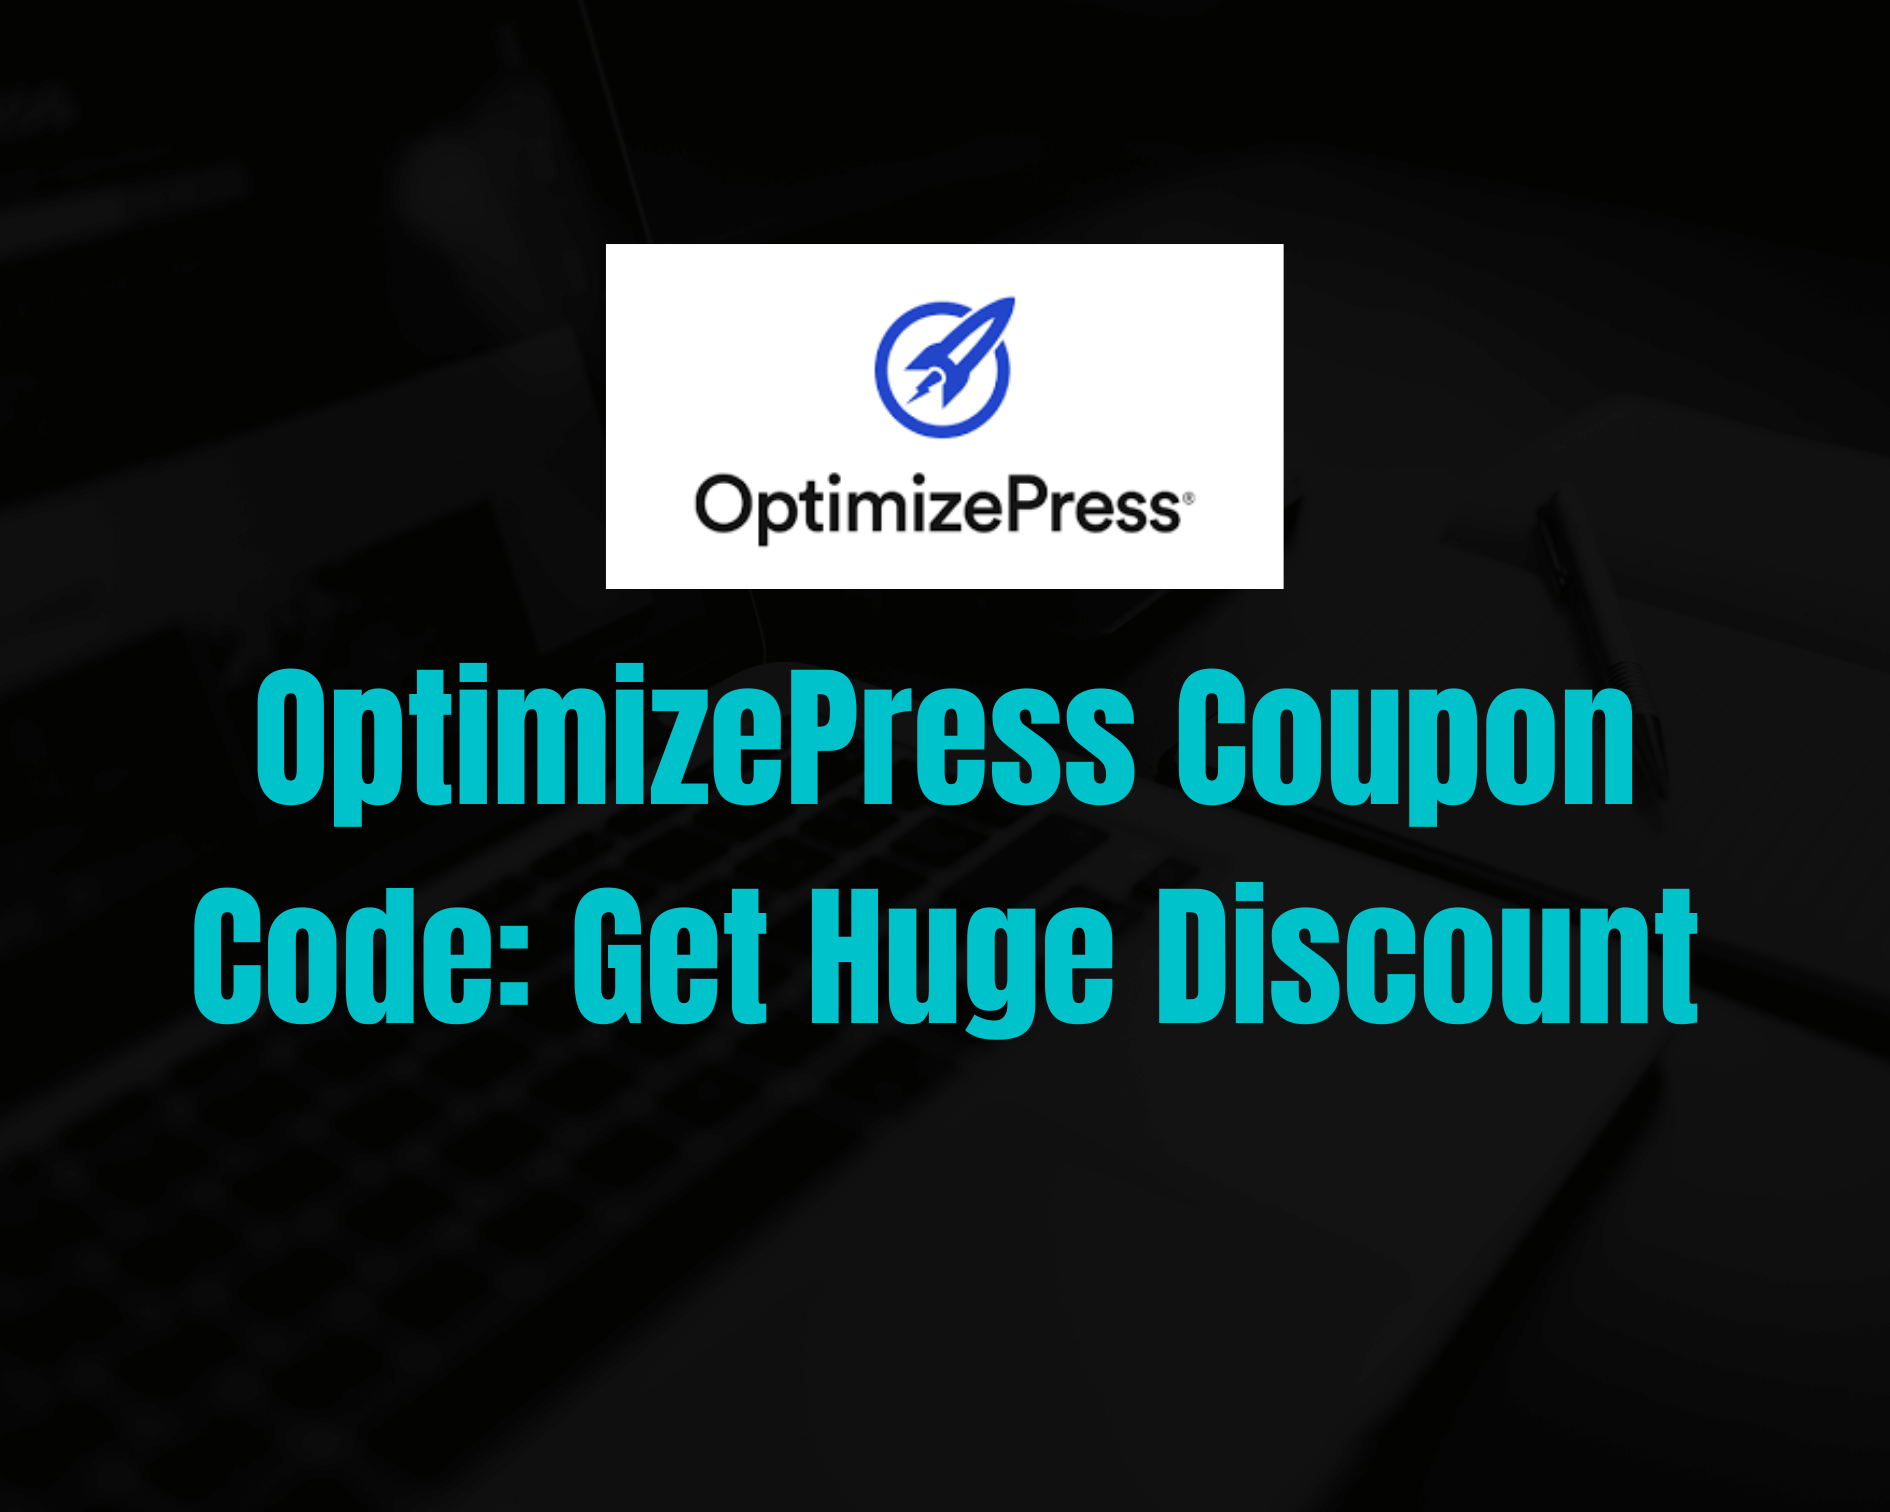 OptimizePress Coupon Code 2020: Get 50% Discount on Plans